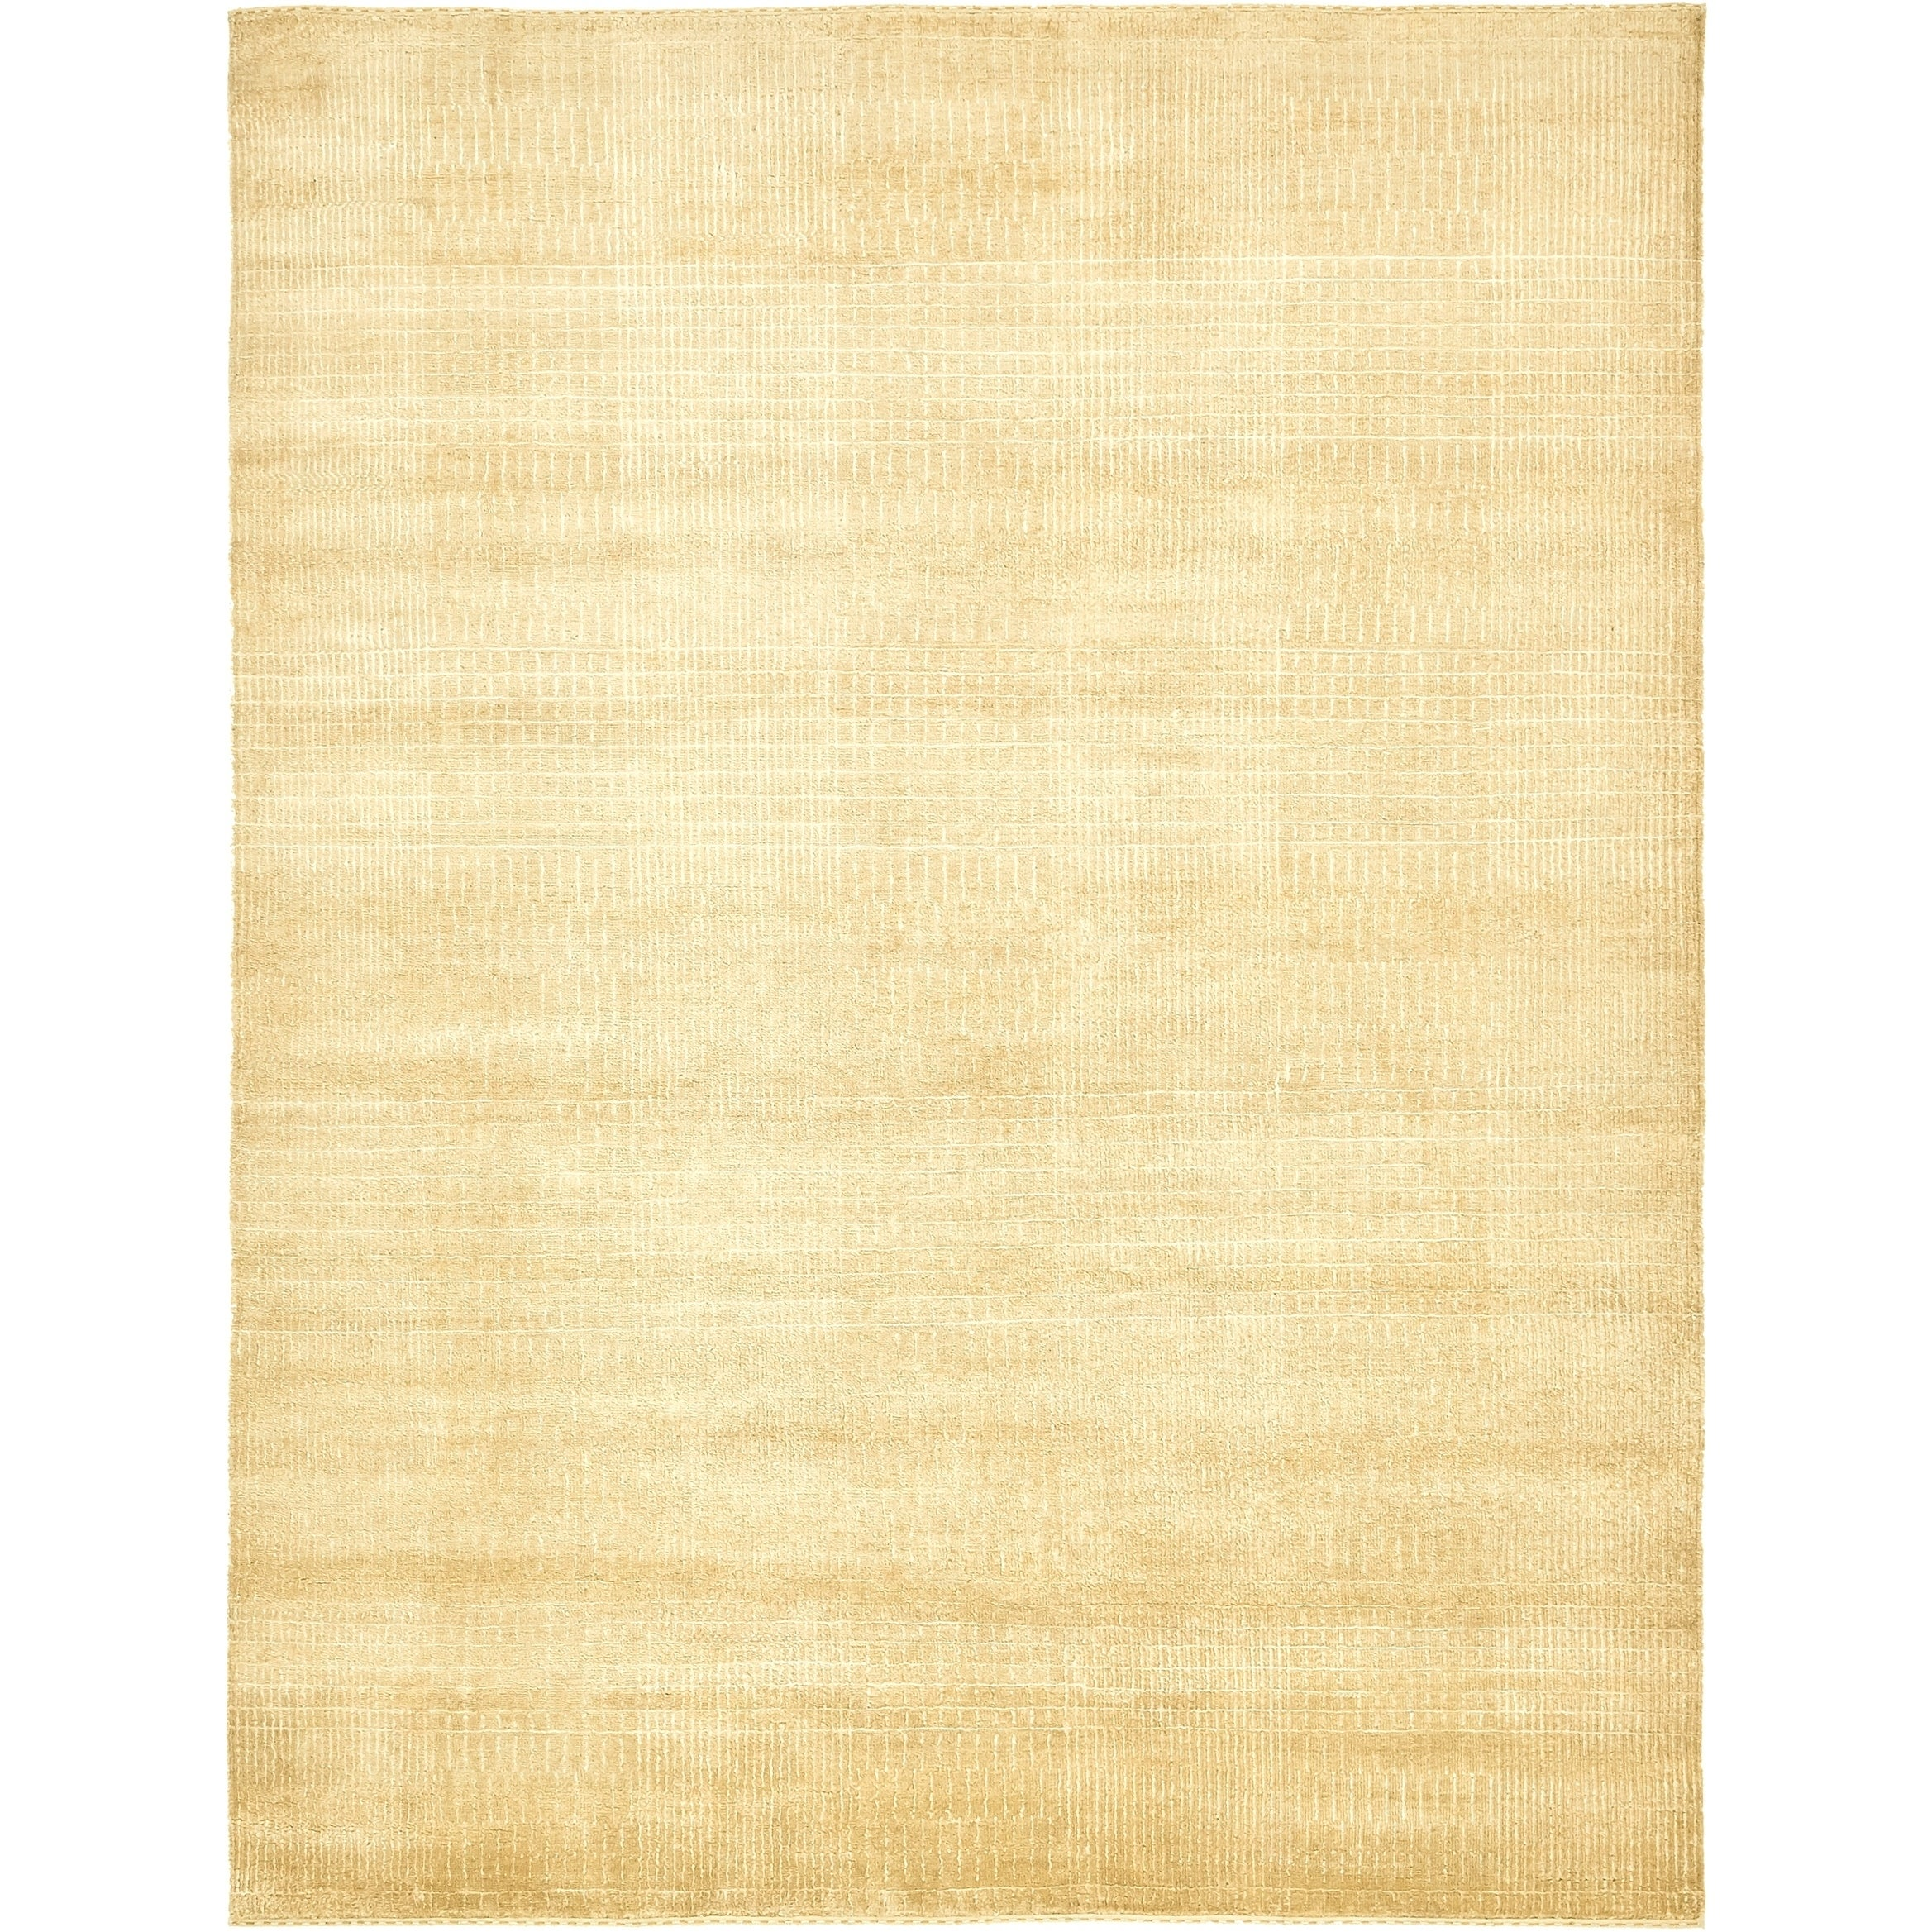 Hand Knotted Kashkuli Gabbeh Silk & Wool Area Rug - 6 5 x 8 4 (Cream - 6 5 x 8 4)